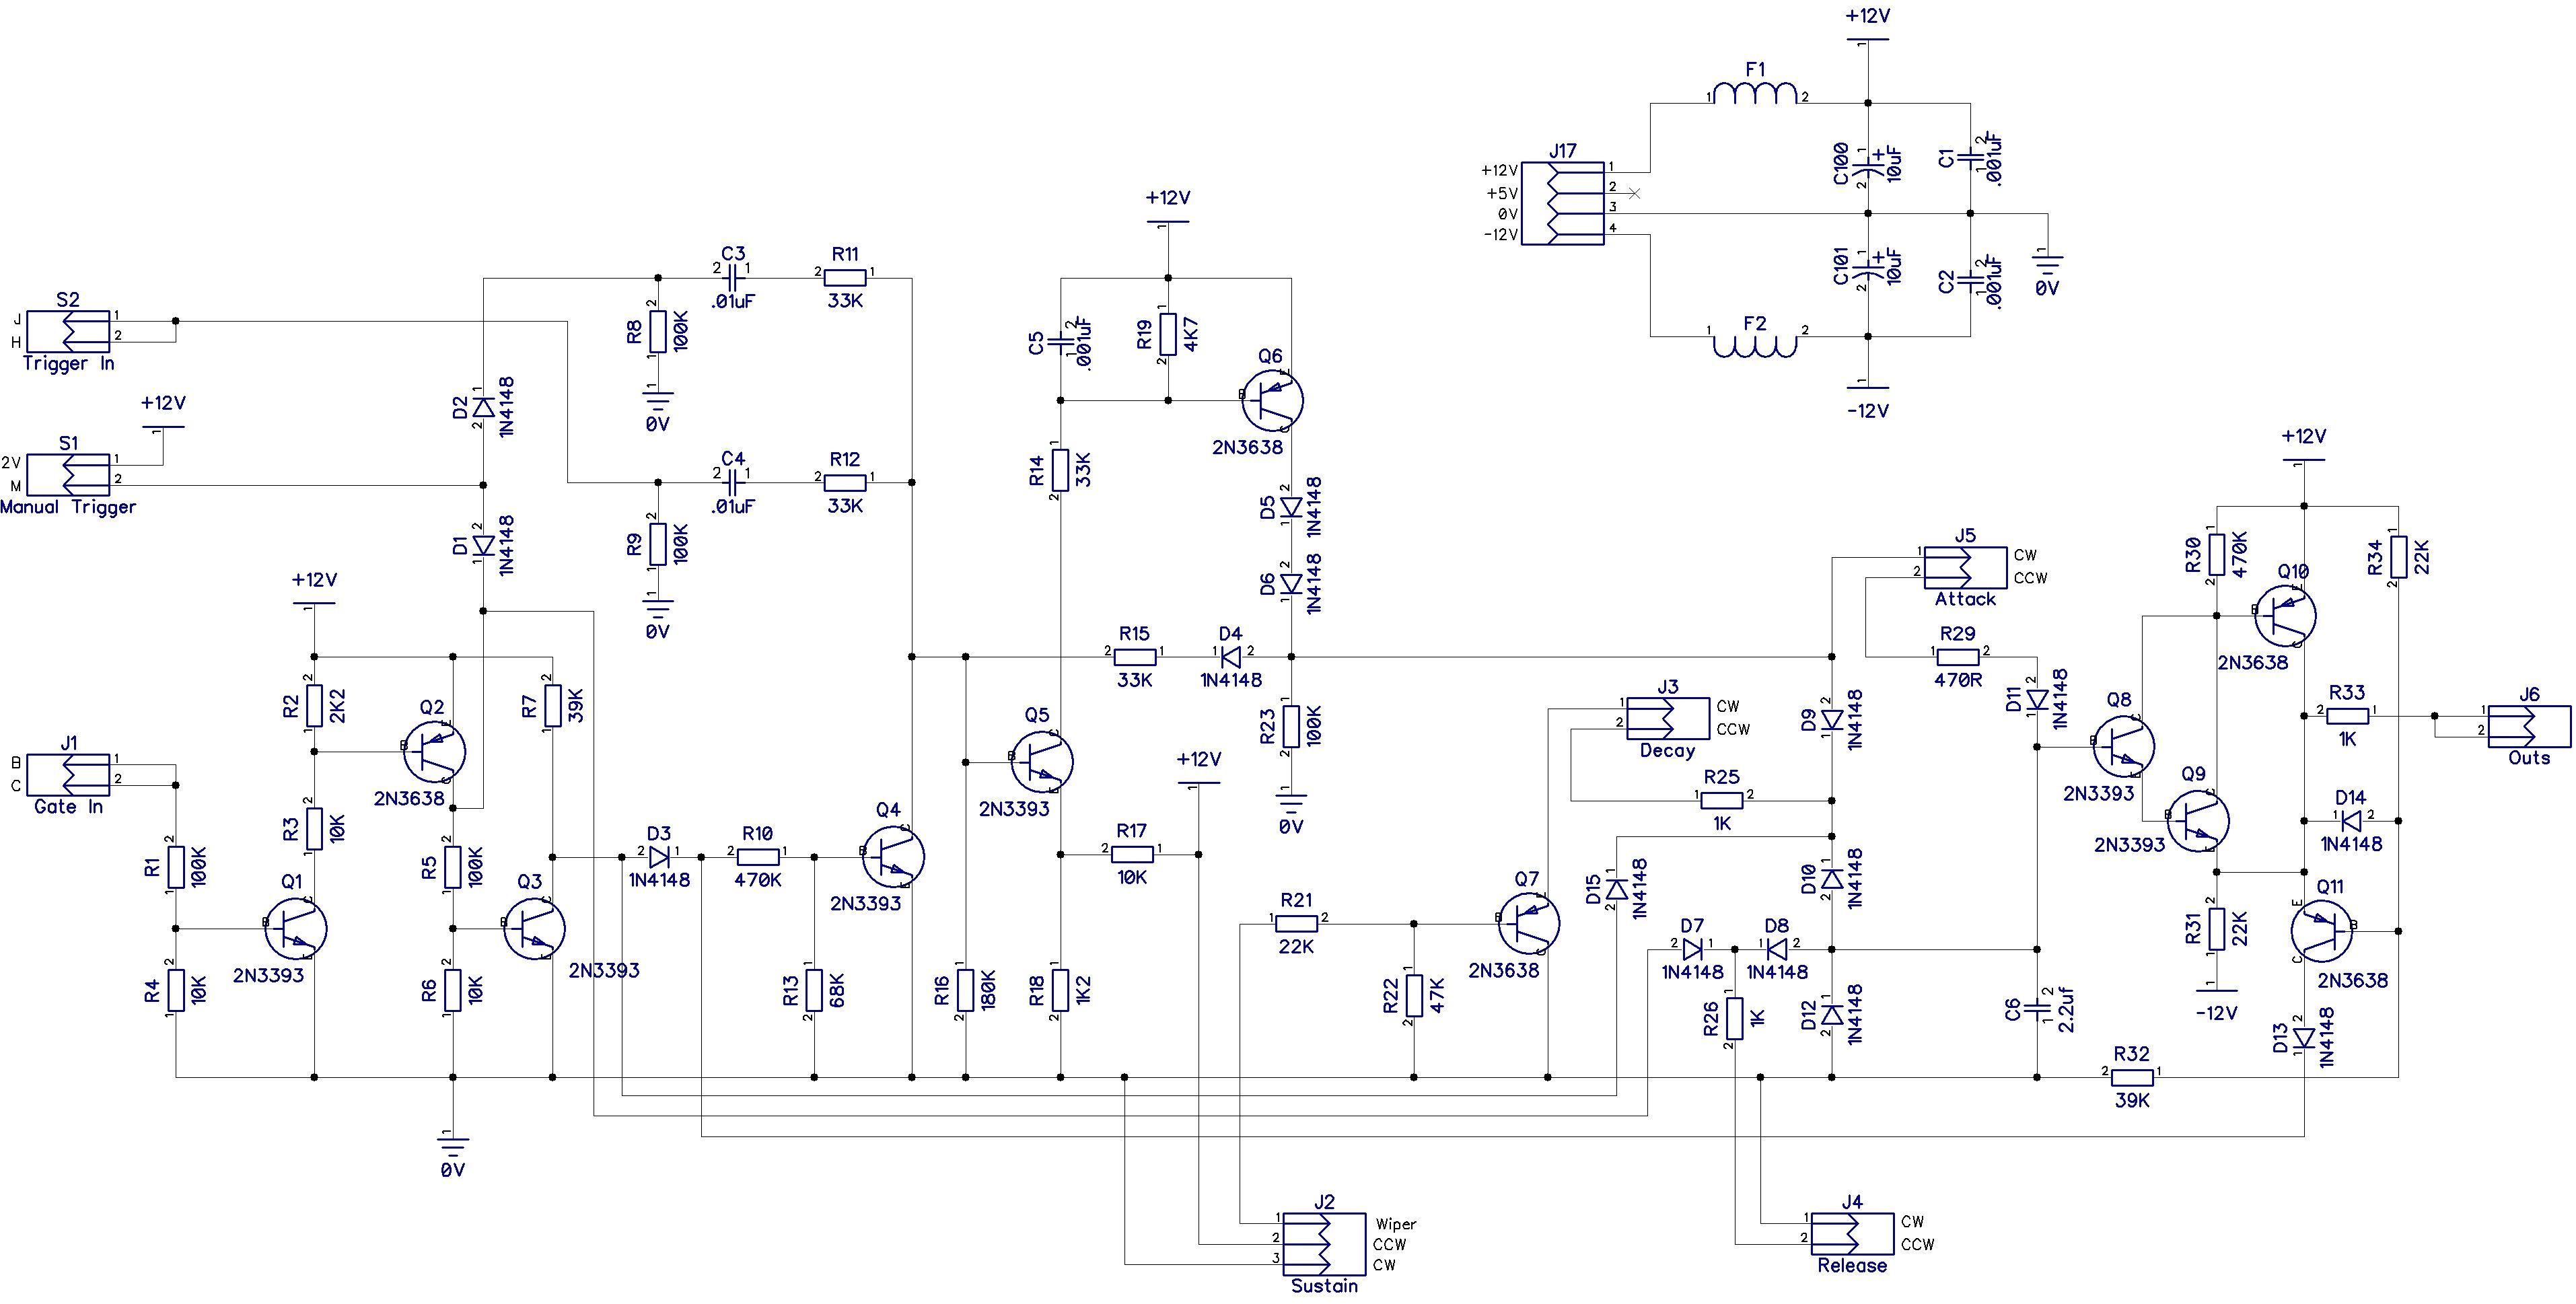 Aries Ar 312 Adsr Module Schematics All About Modular Synth Sk1 Getlofi Circuit Bending Diy